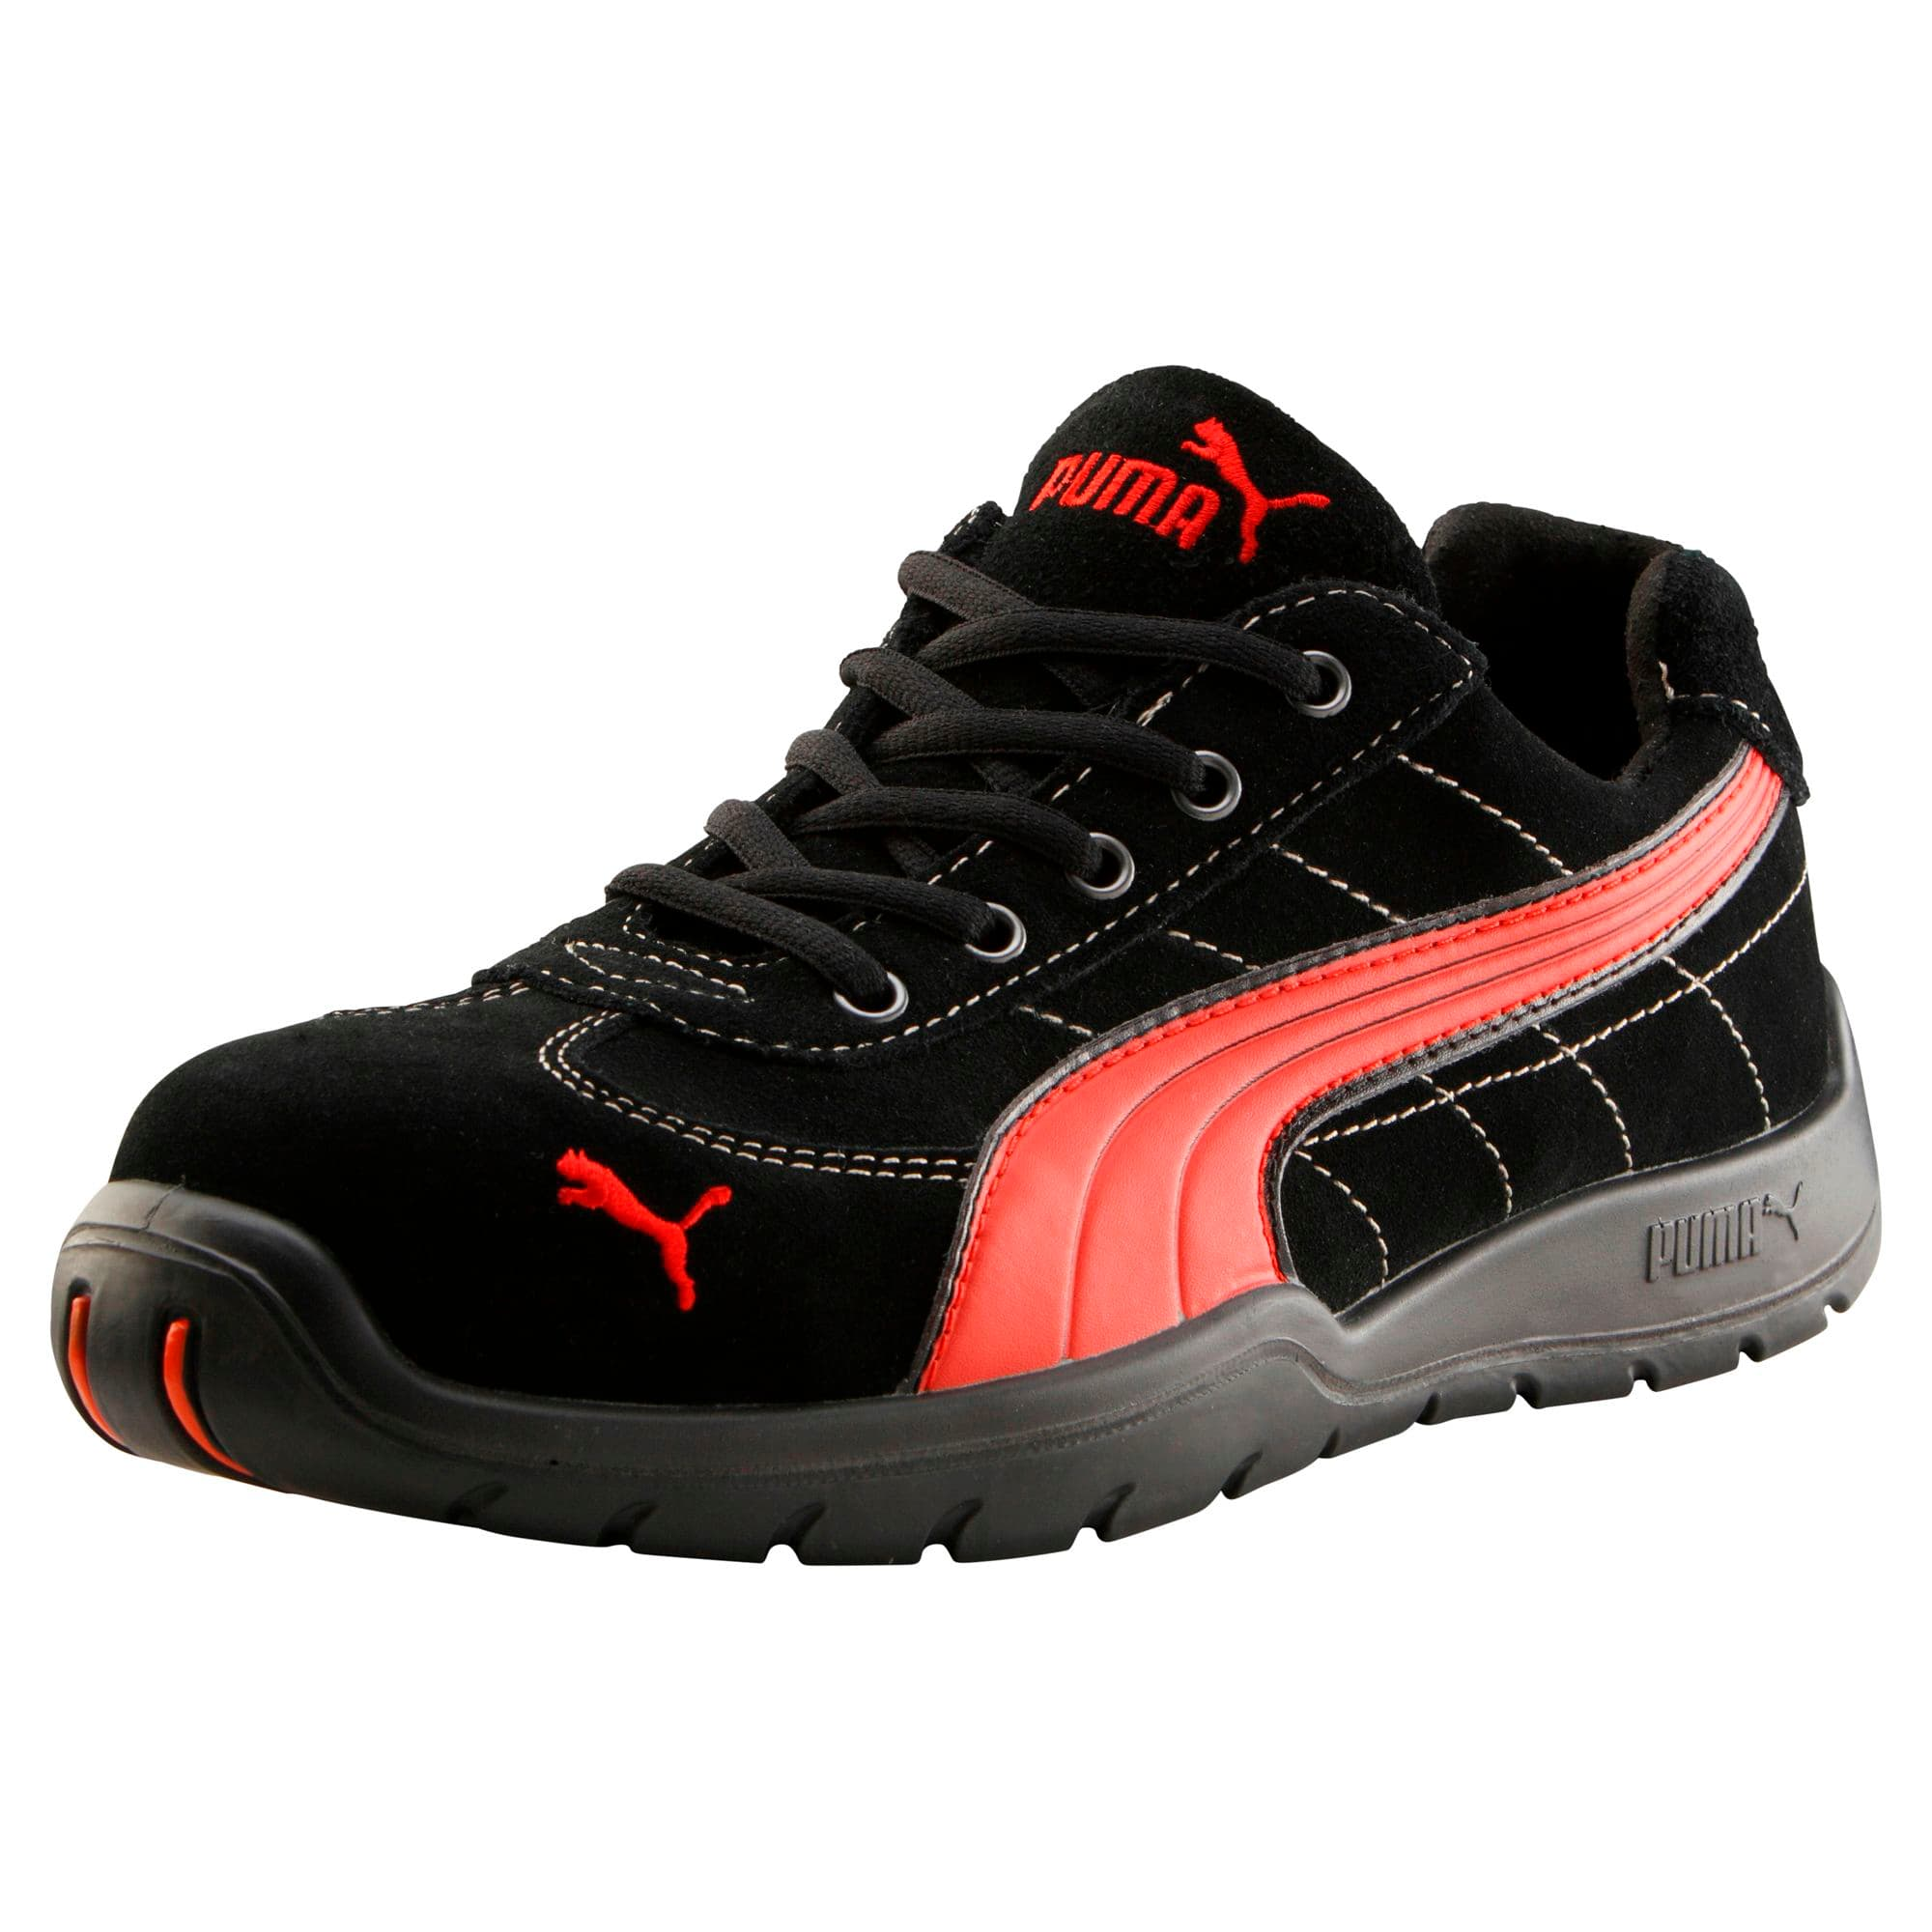 scarpe antinfortunistica uomo puma